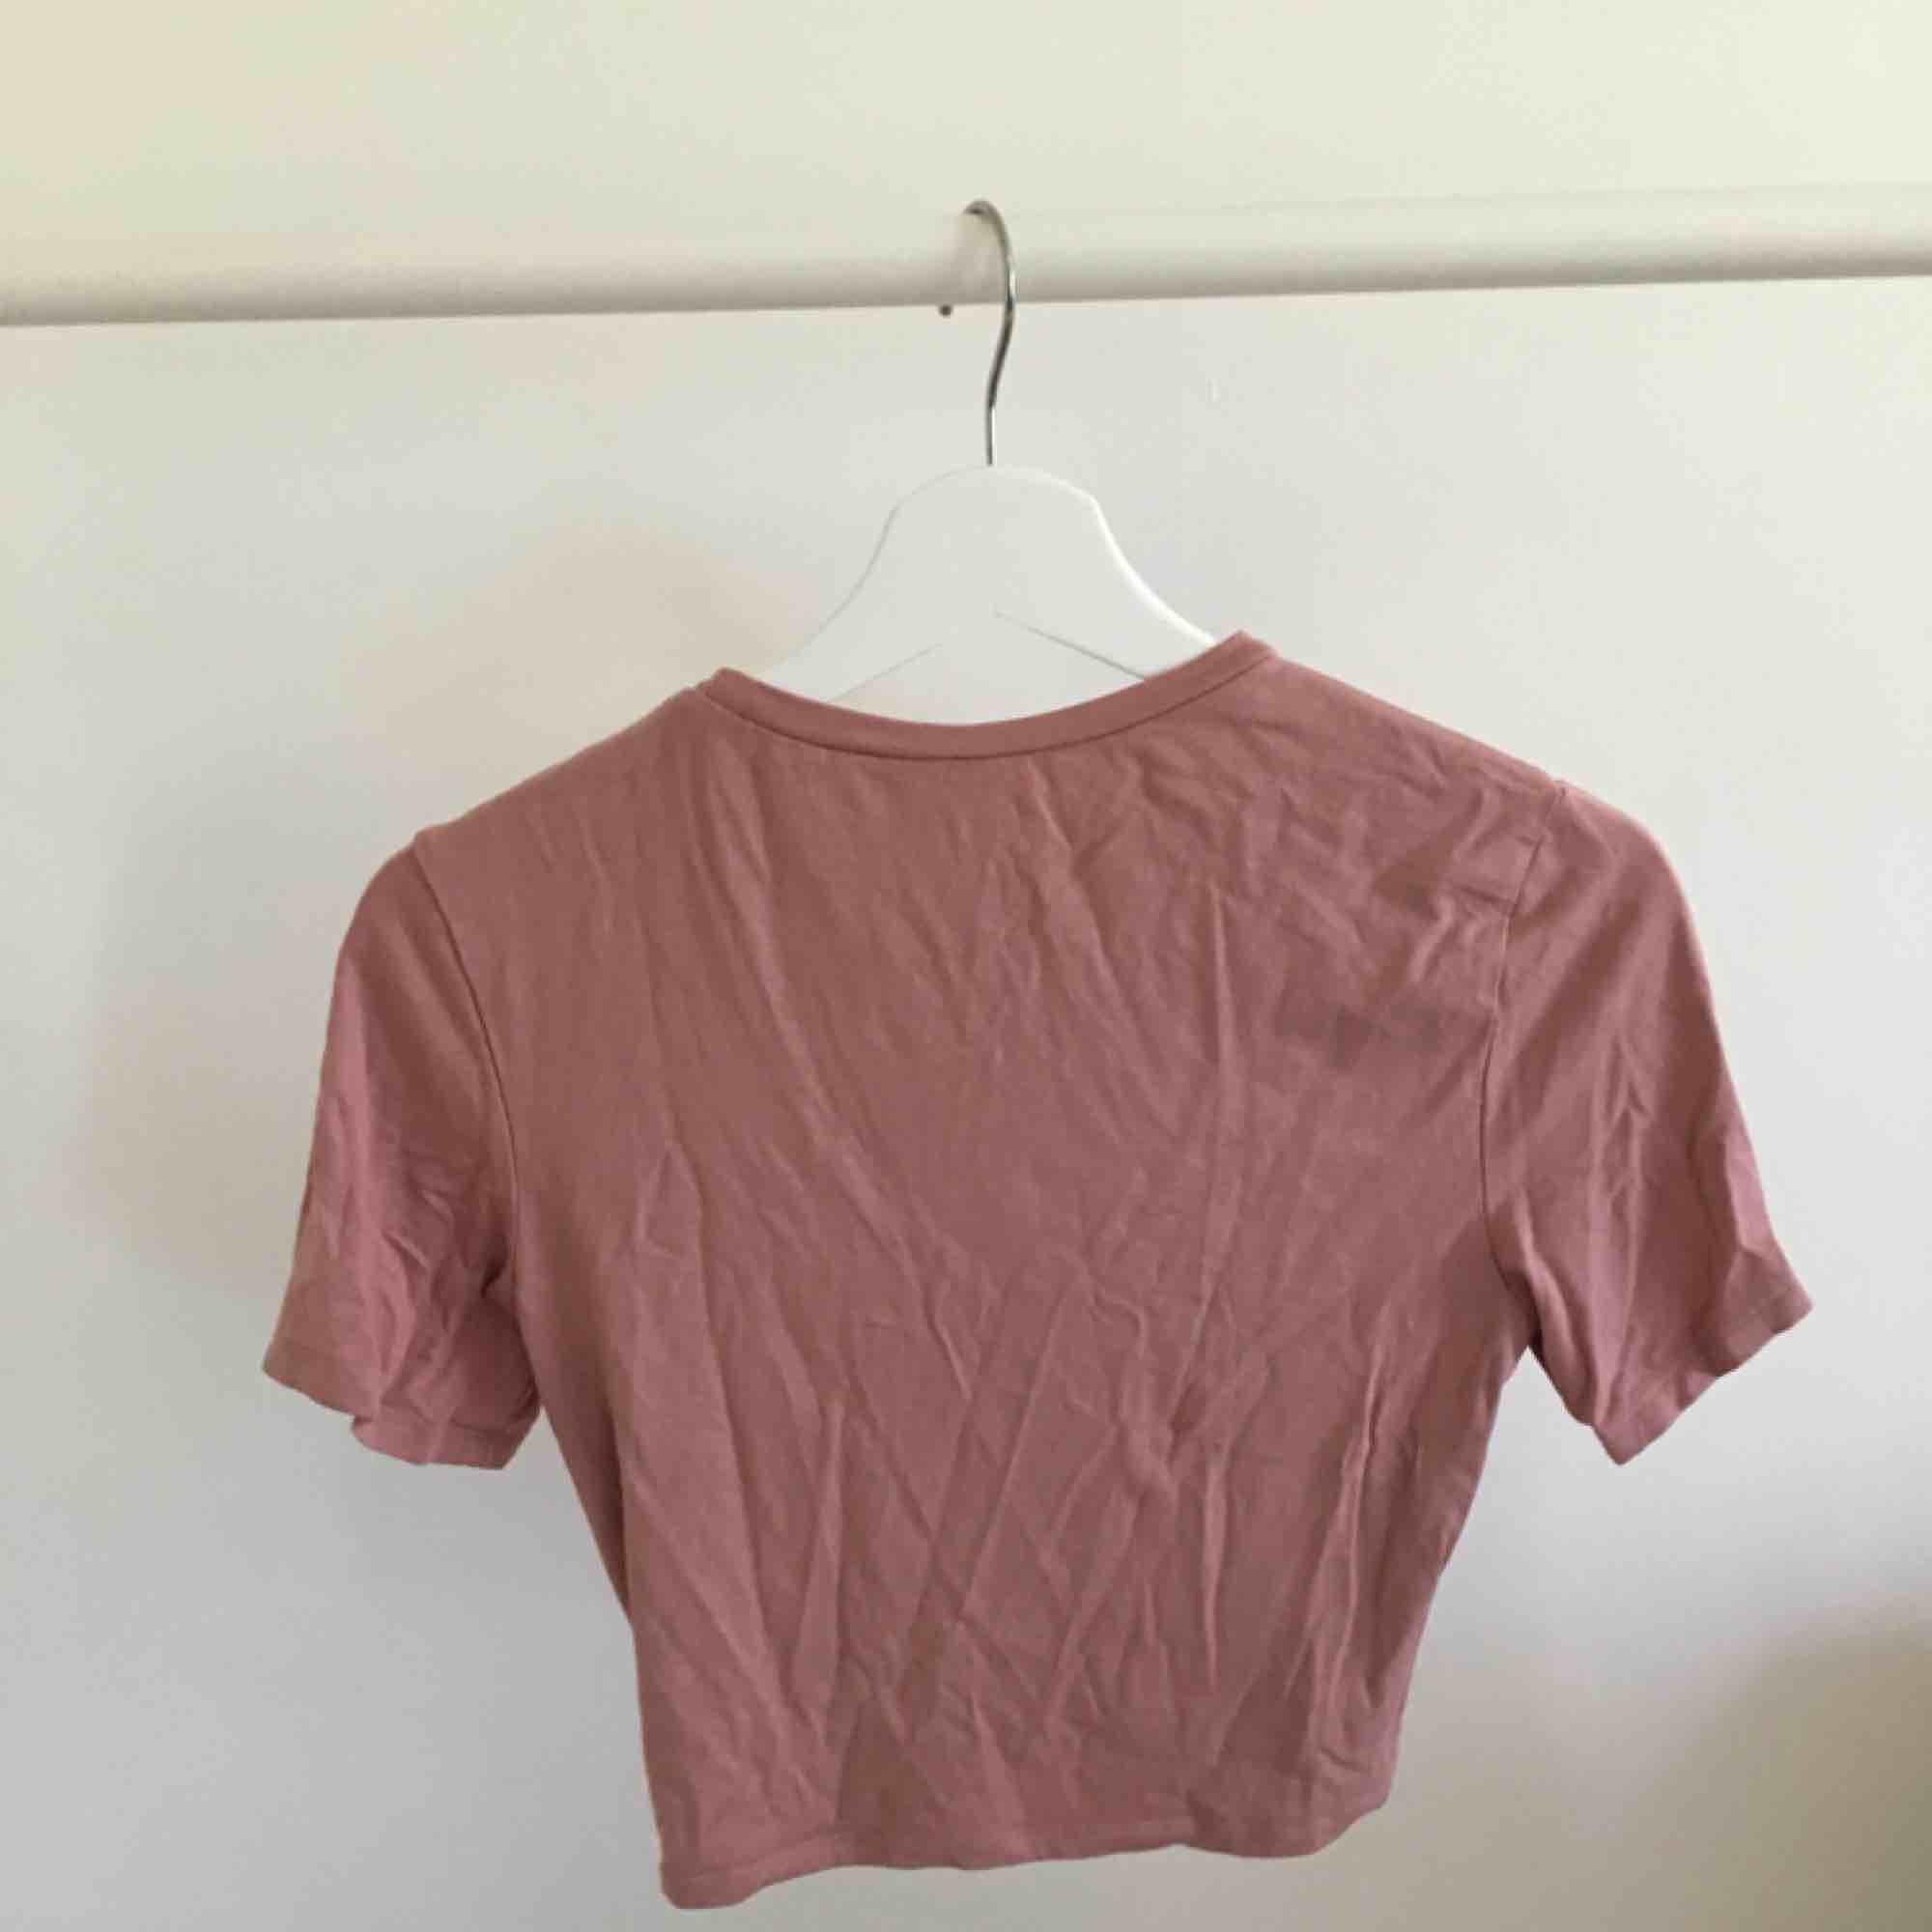 Rosa magtröja, bra kvalitet . T-shirts.